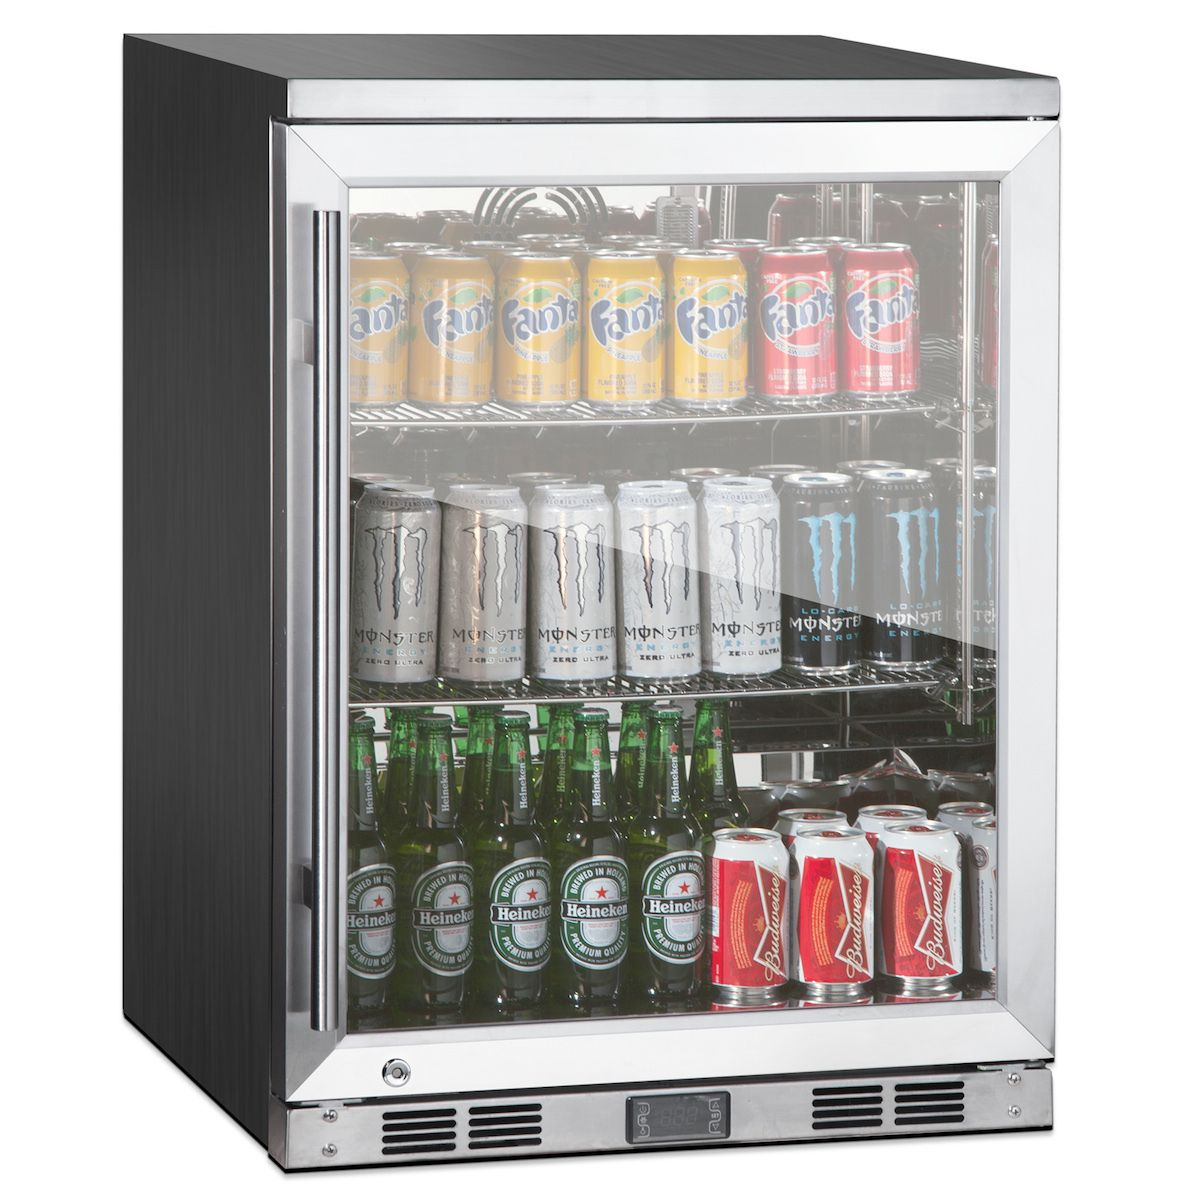 24 Undercounter Heating Glass Door Refrigerator With Stainless Exterior And Interior Bar Refrigeratorhouse Appliancesstainless Steel